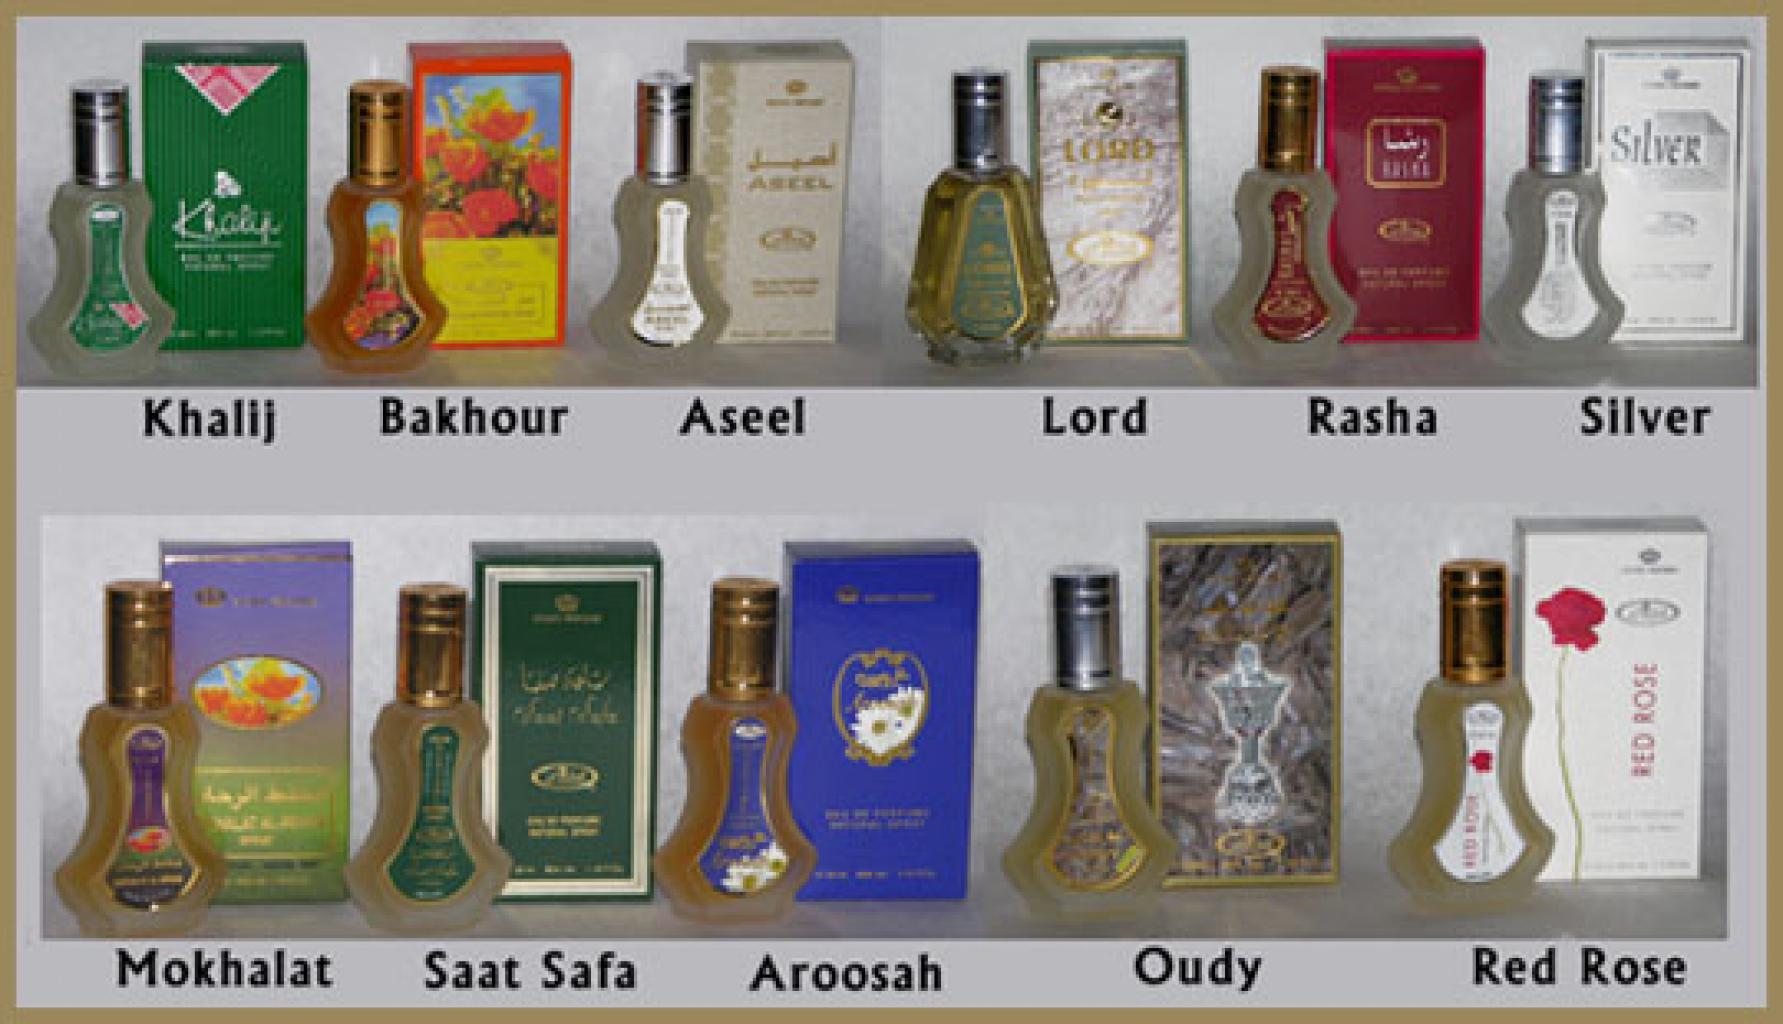 Al Rehab Saudi Boxed Spray Perfume in218